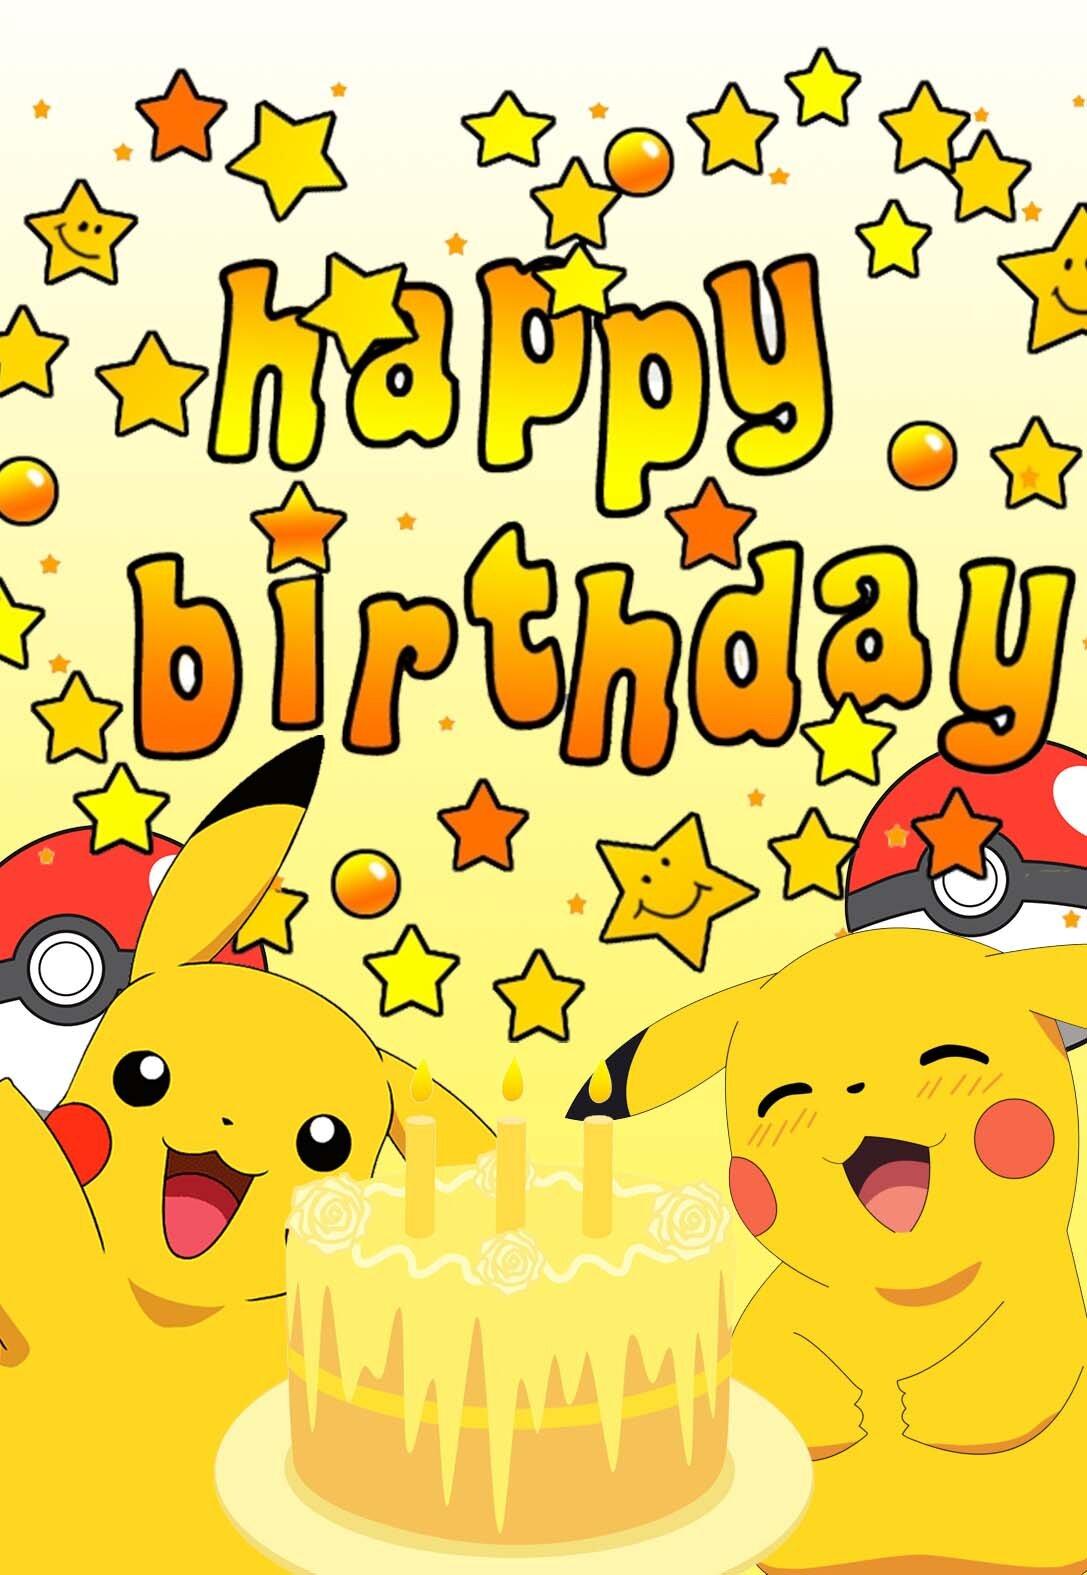 Pikachu Printable Birthday Cards — PRINTBIRTHDAY.CARDS